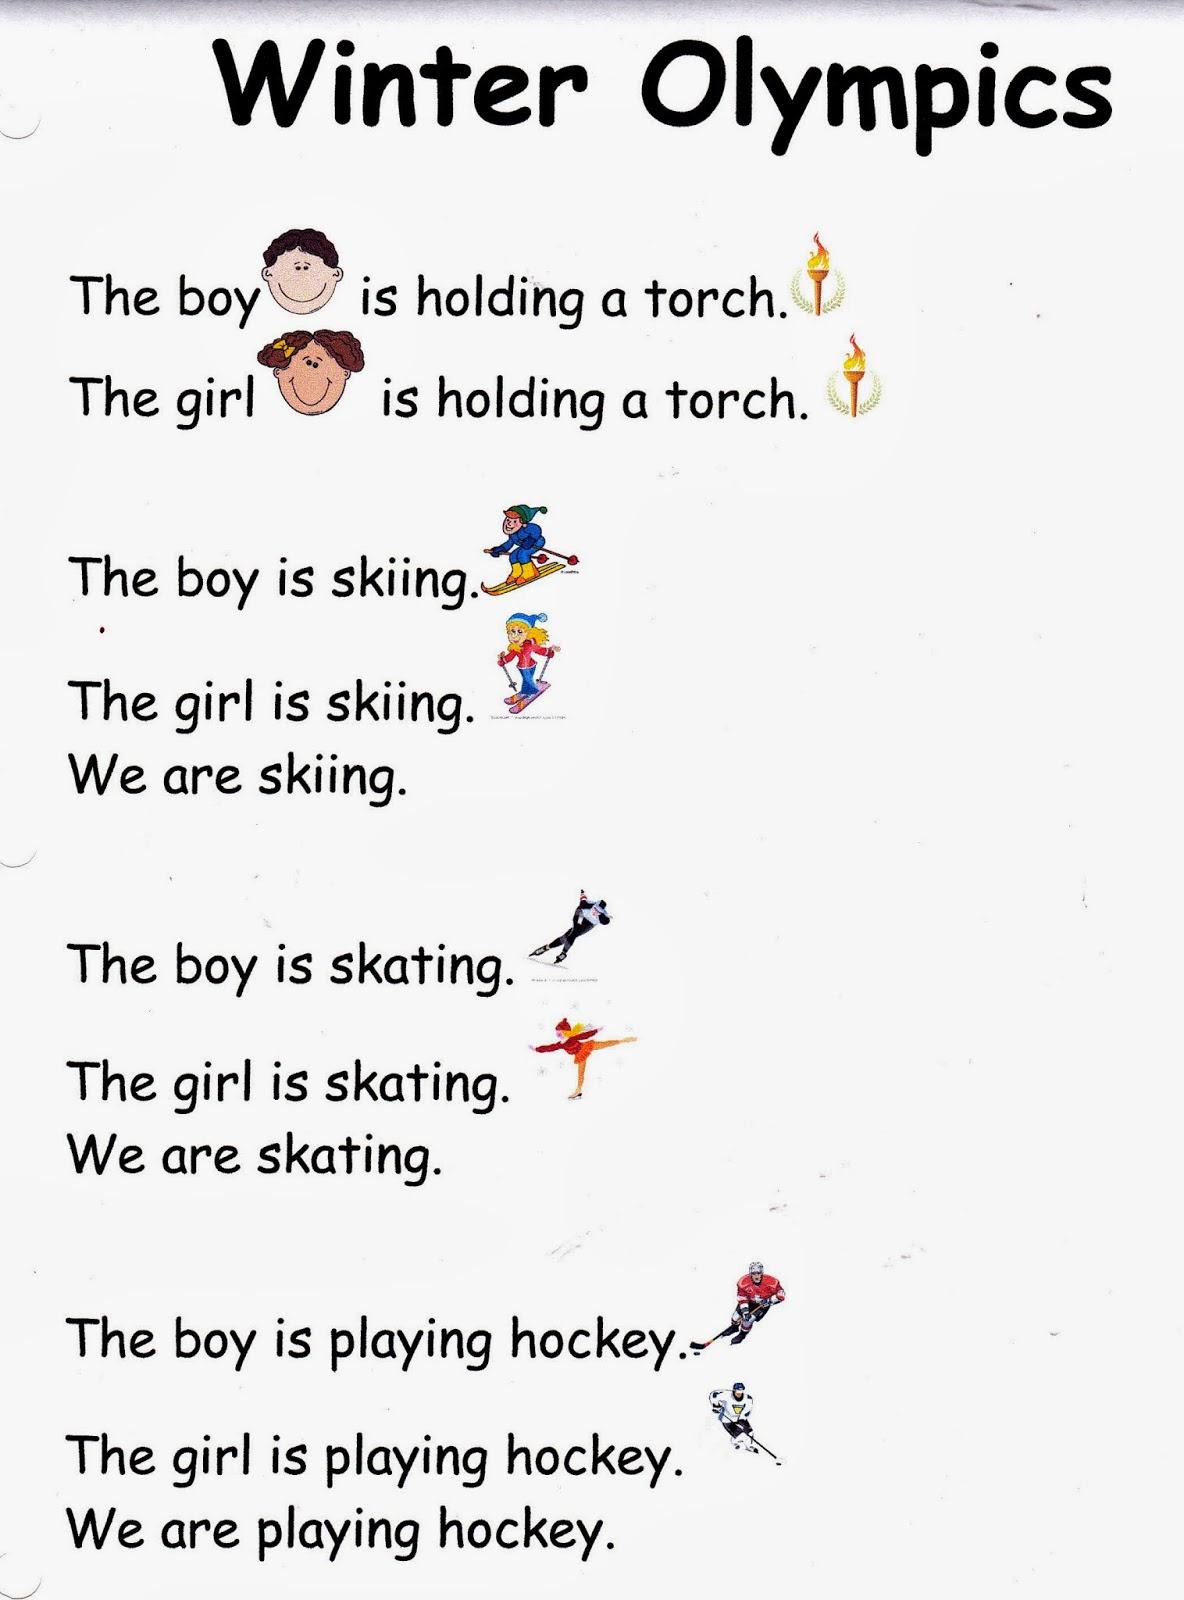 Metamora Community Preschool Winter Olympics Words And